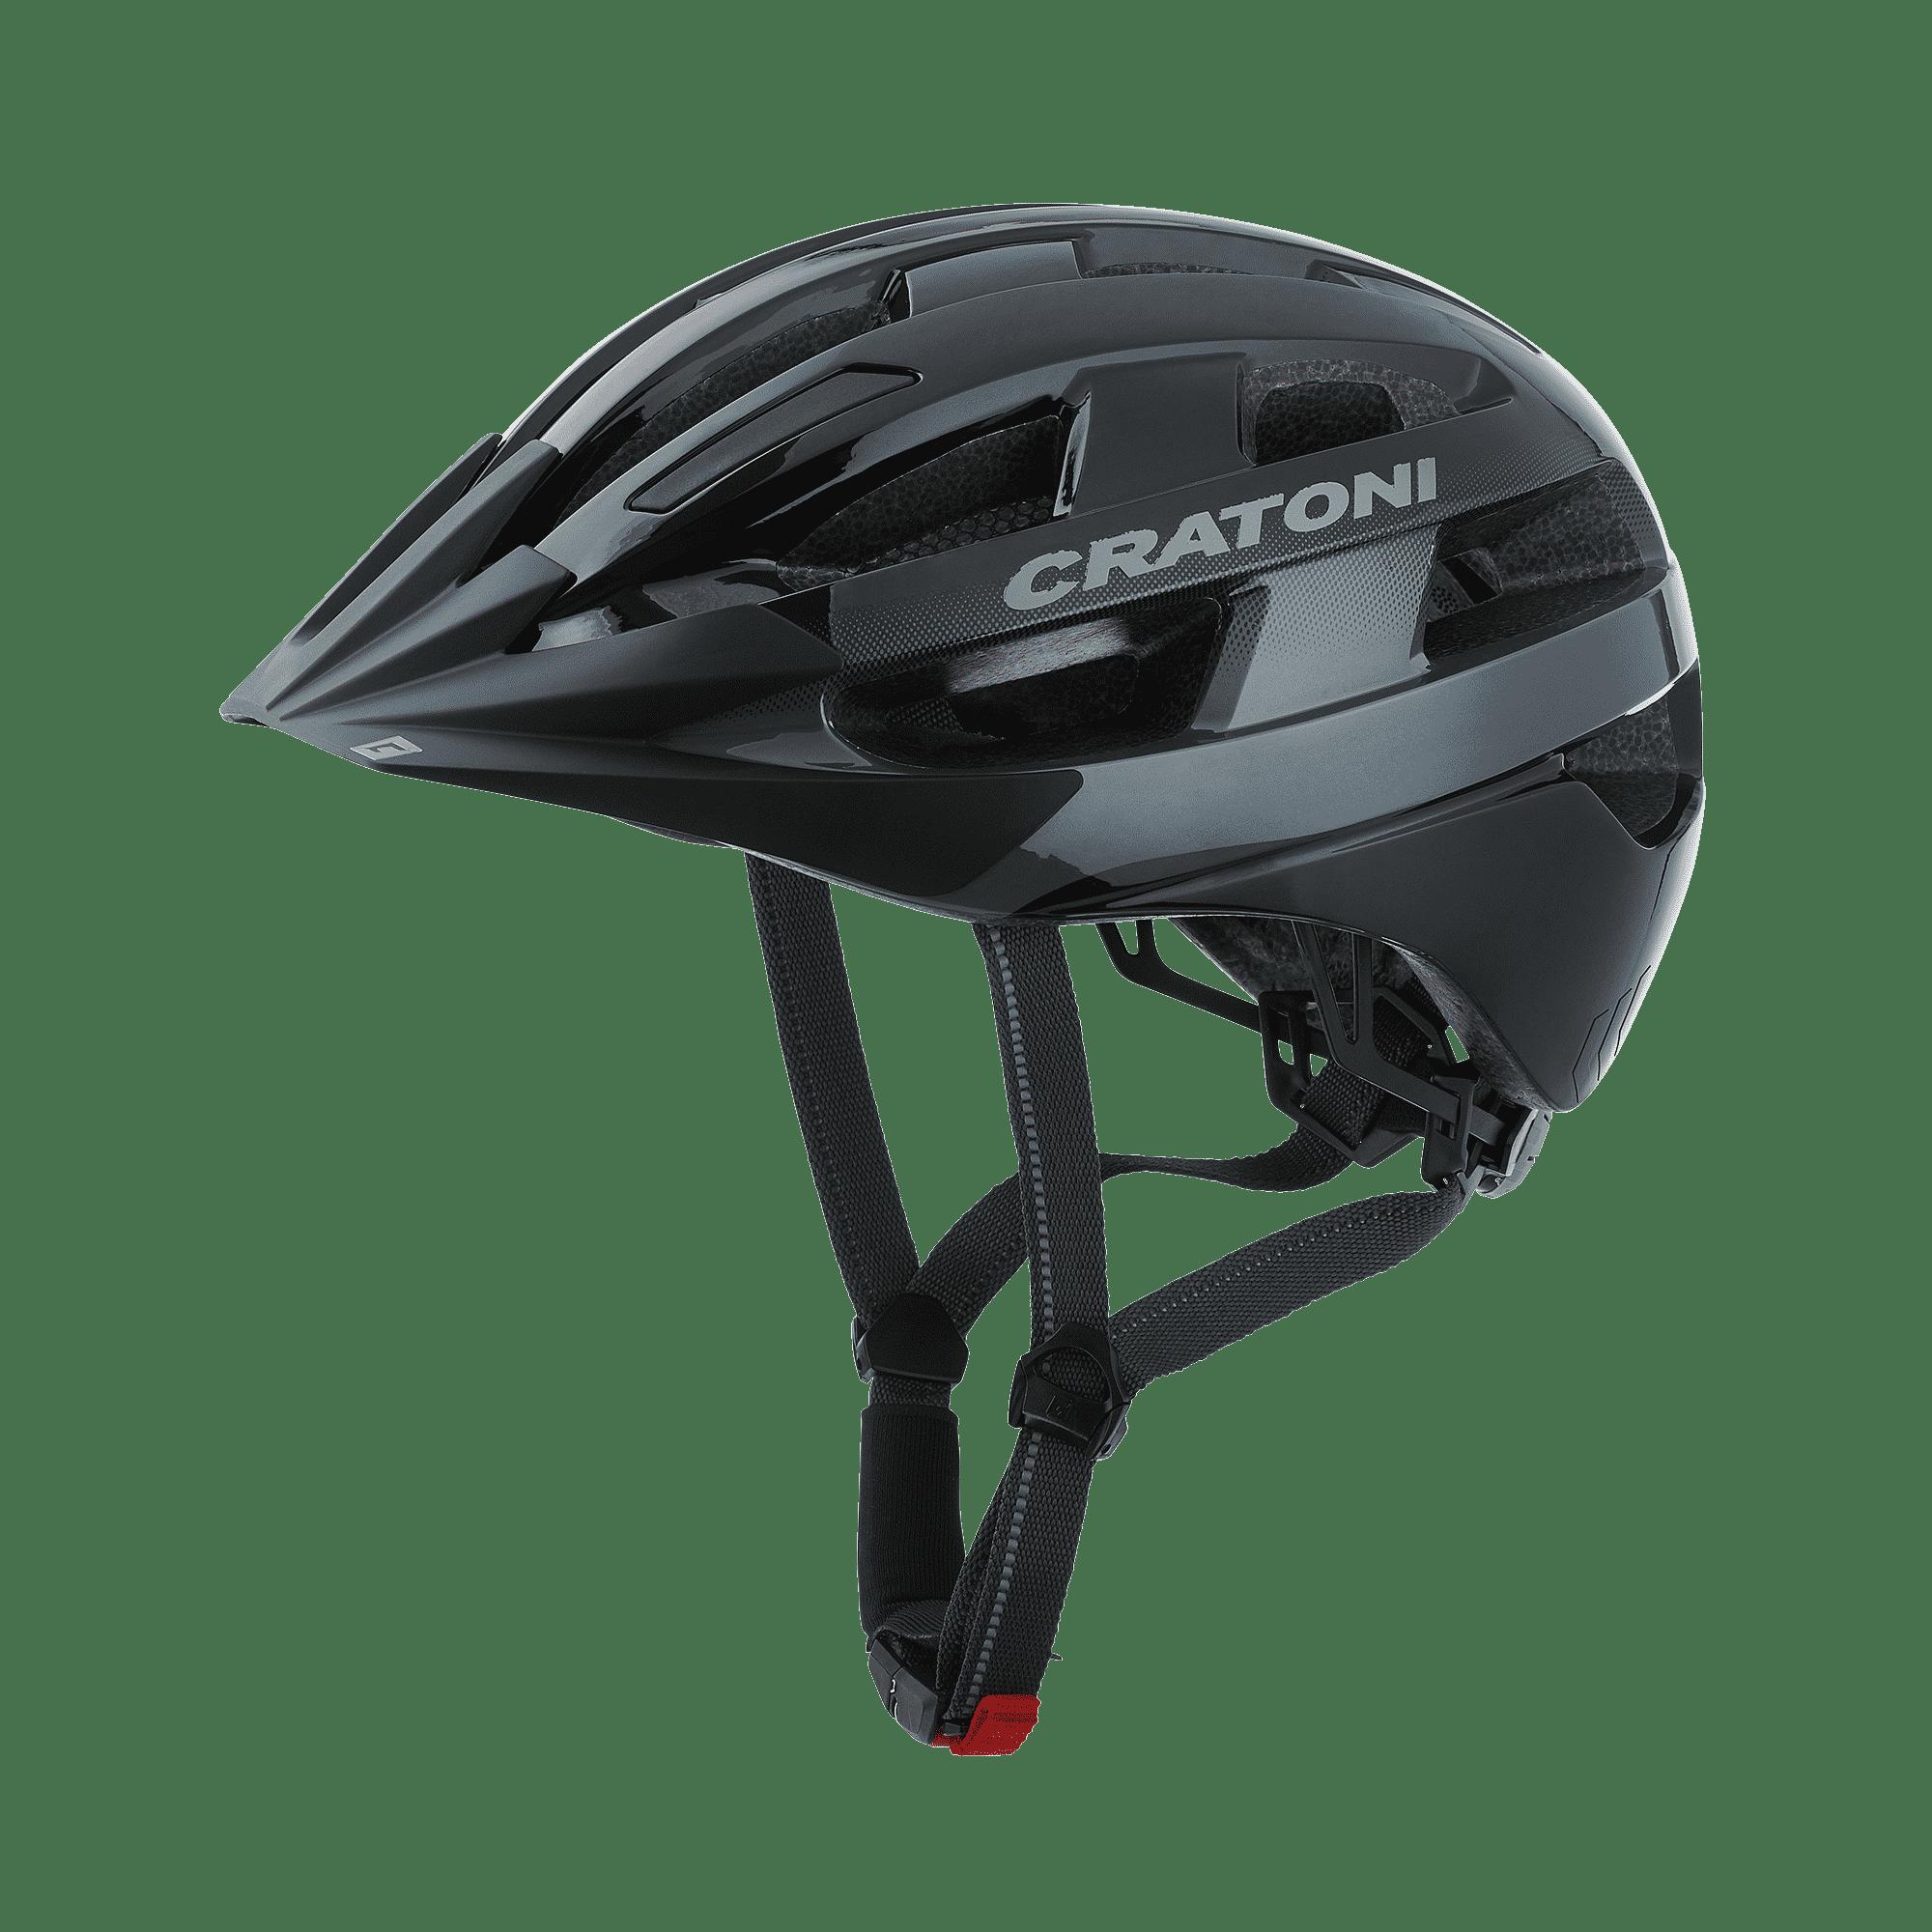 Cratoni Velo-X black glossy